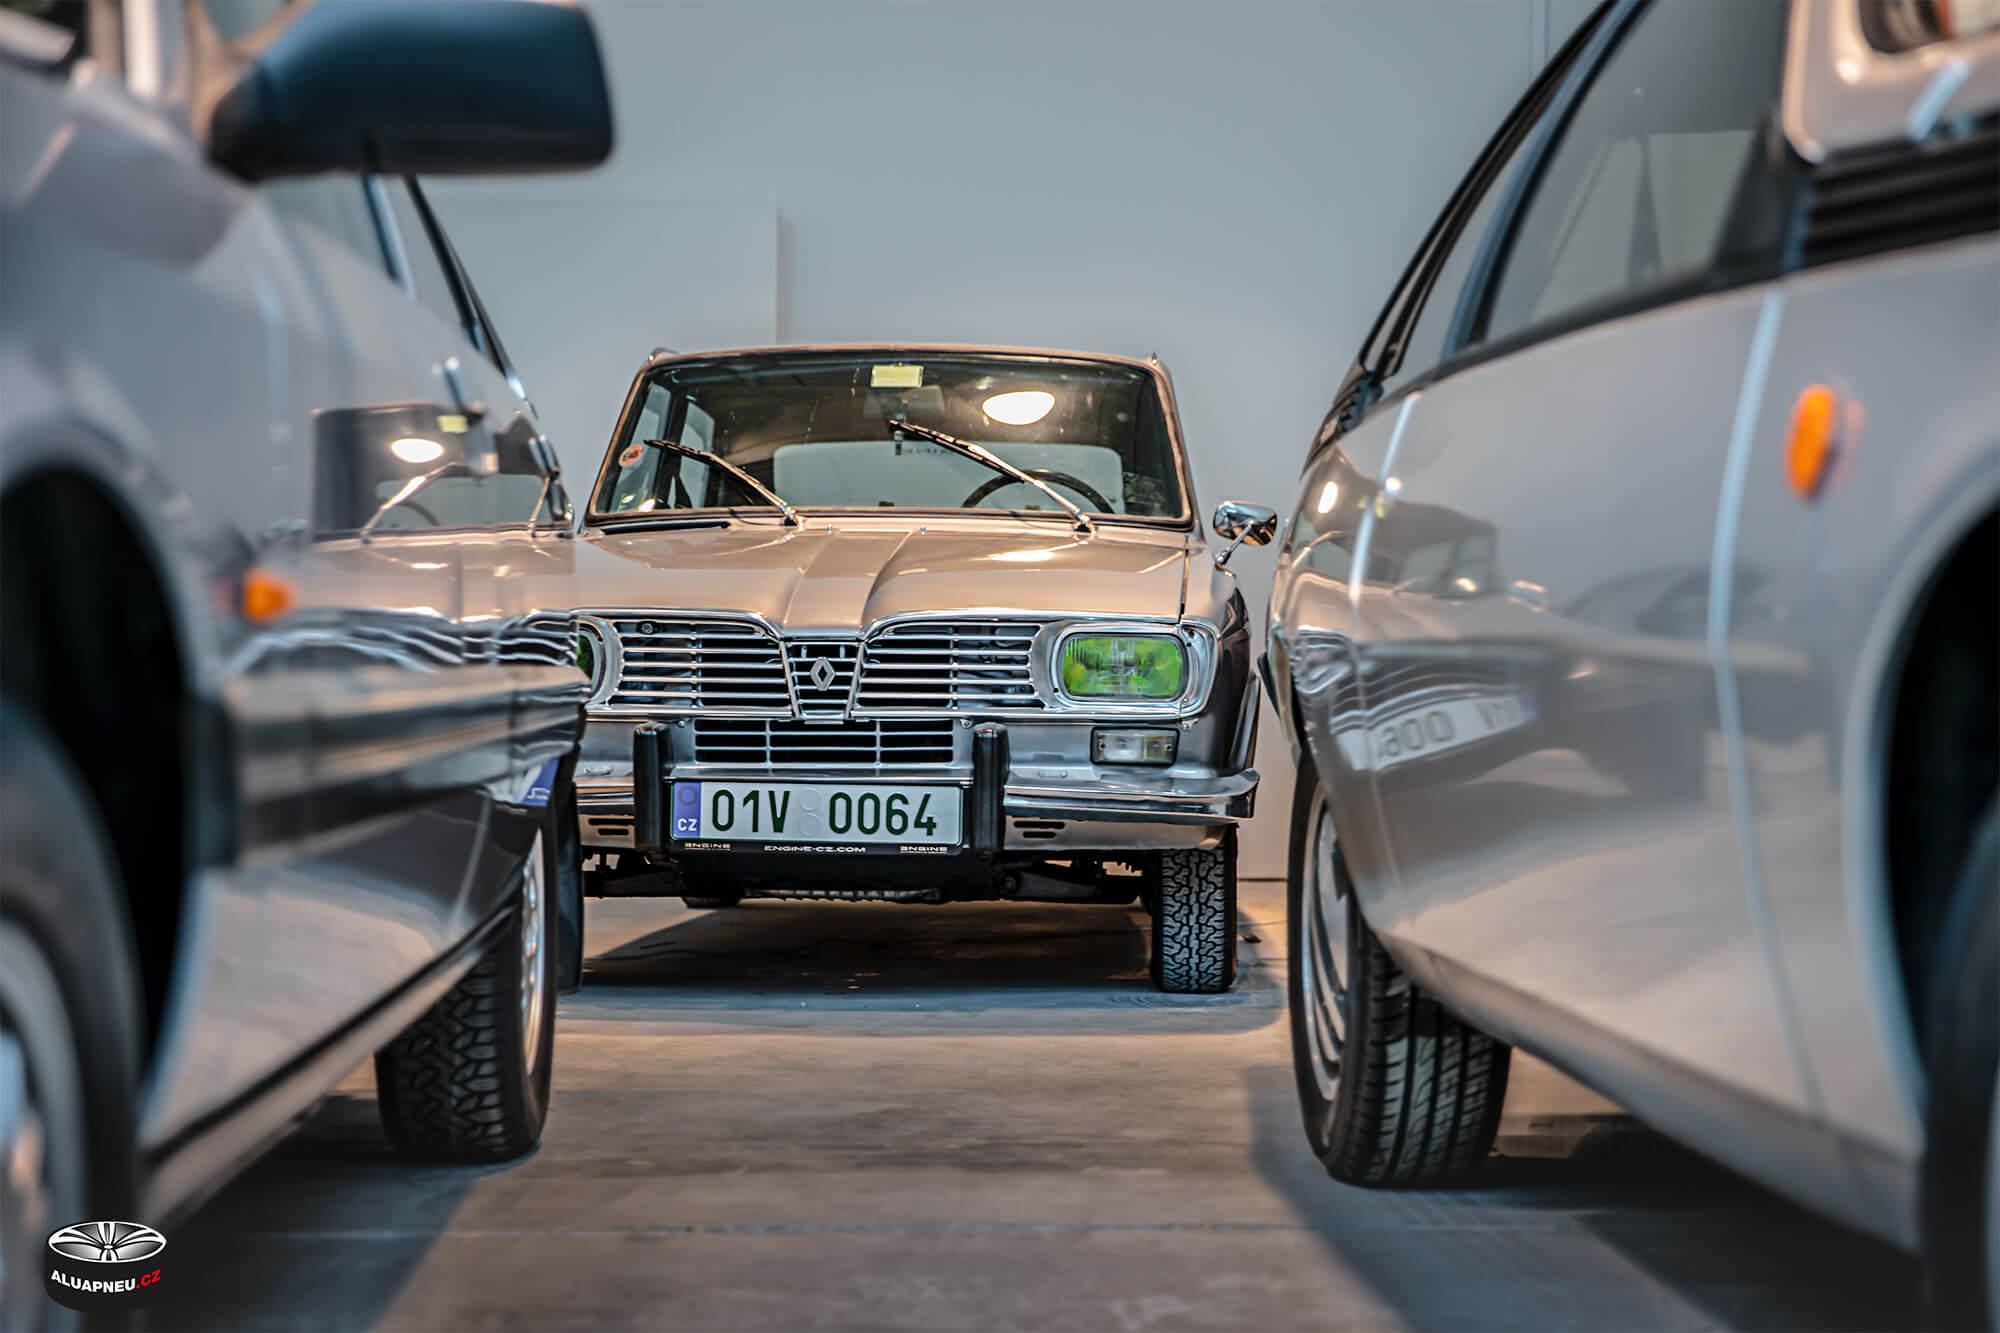 Renault - Youngtimer - www.aluapneu.cz